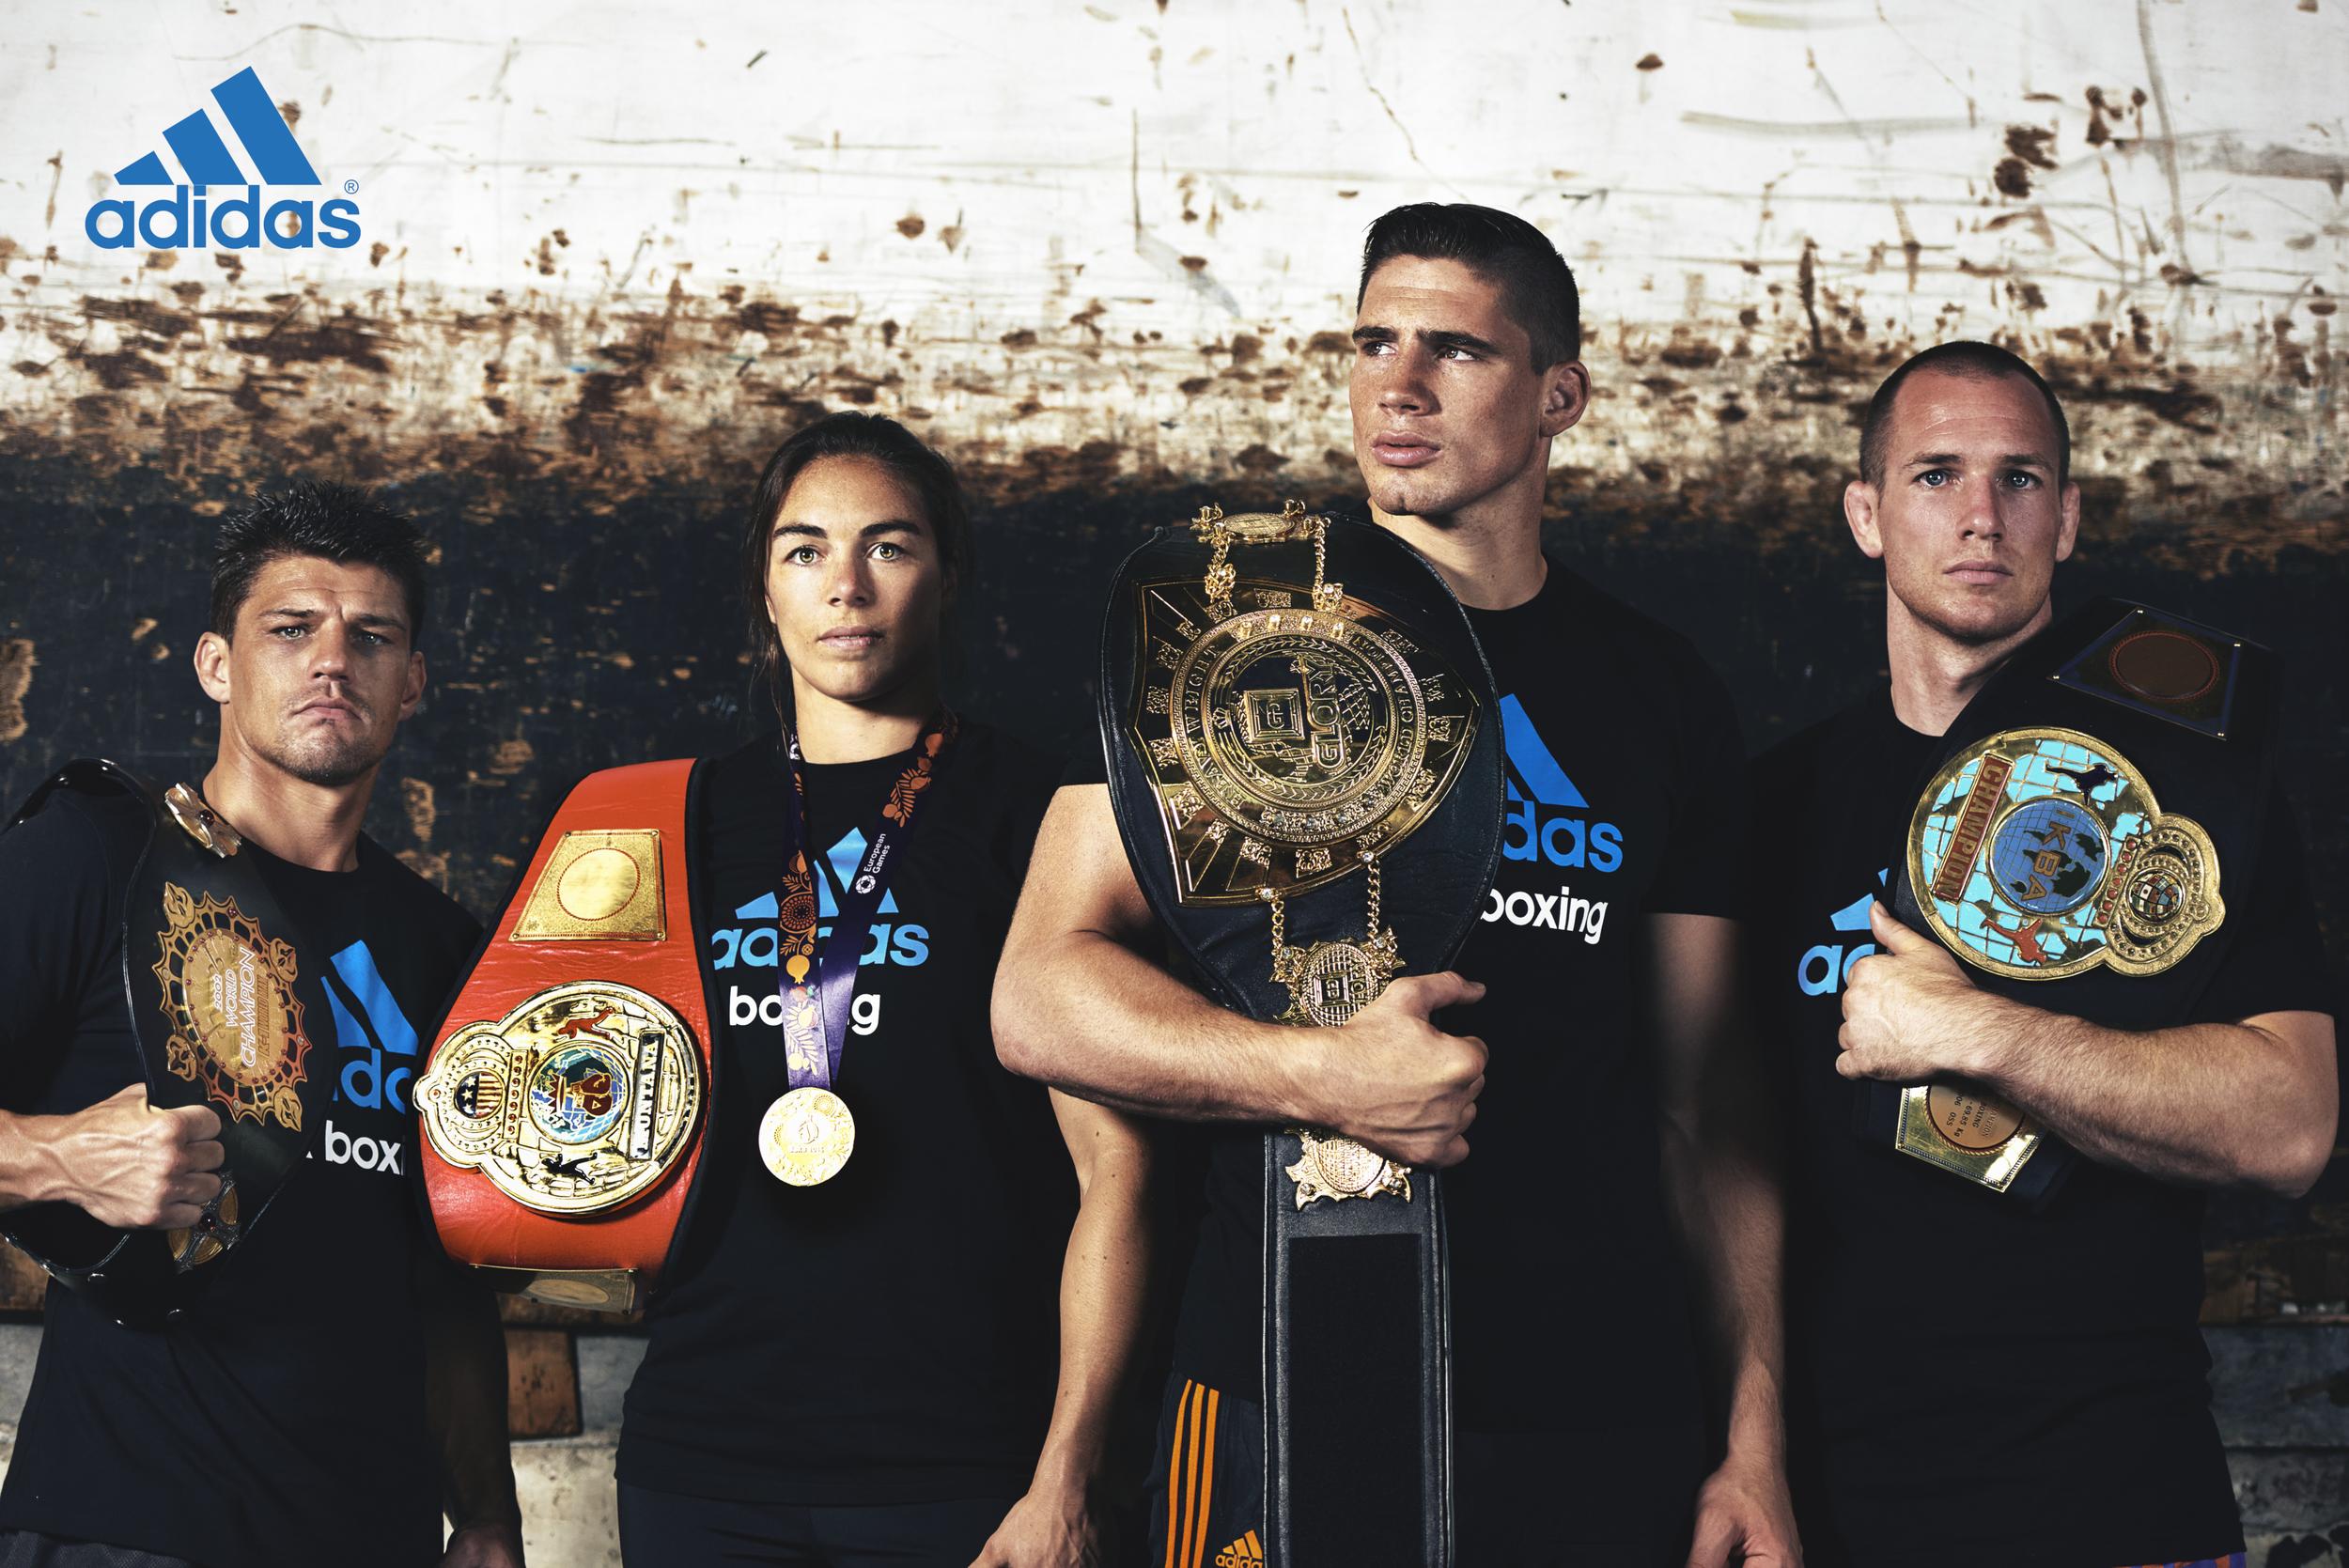 Adidas Boxing NL